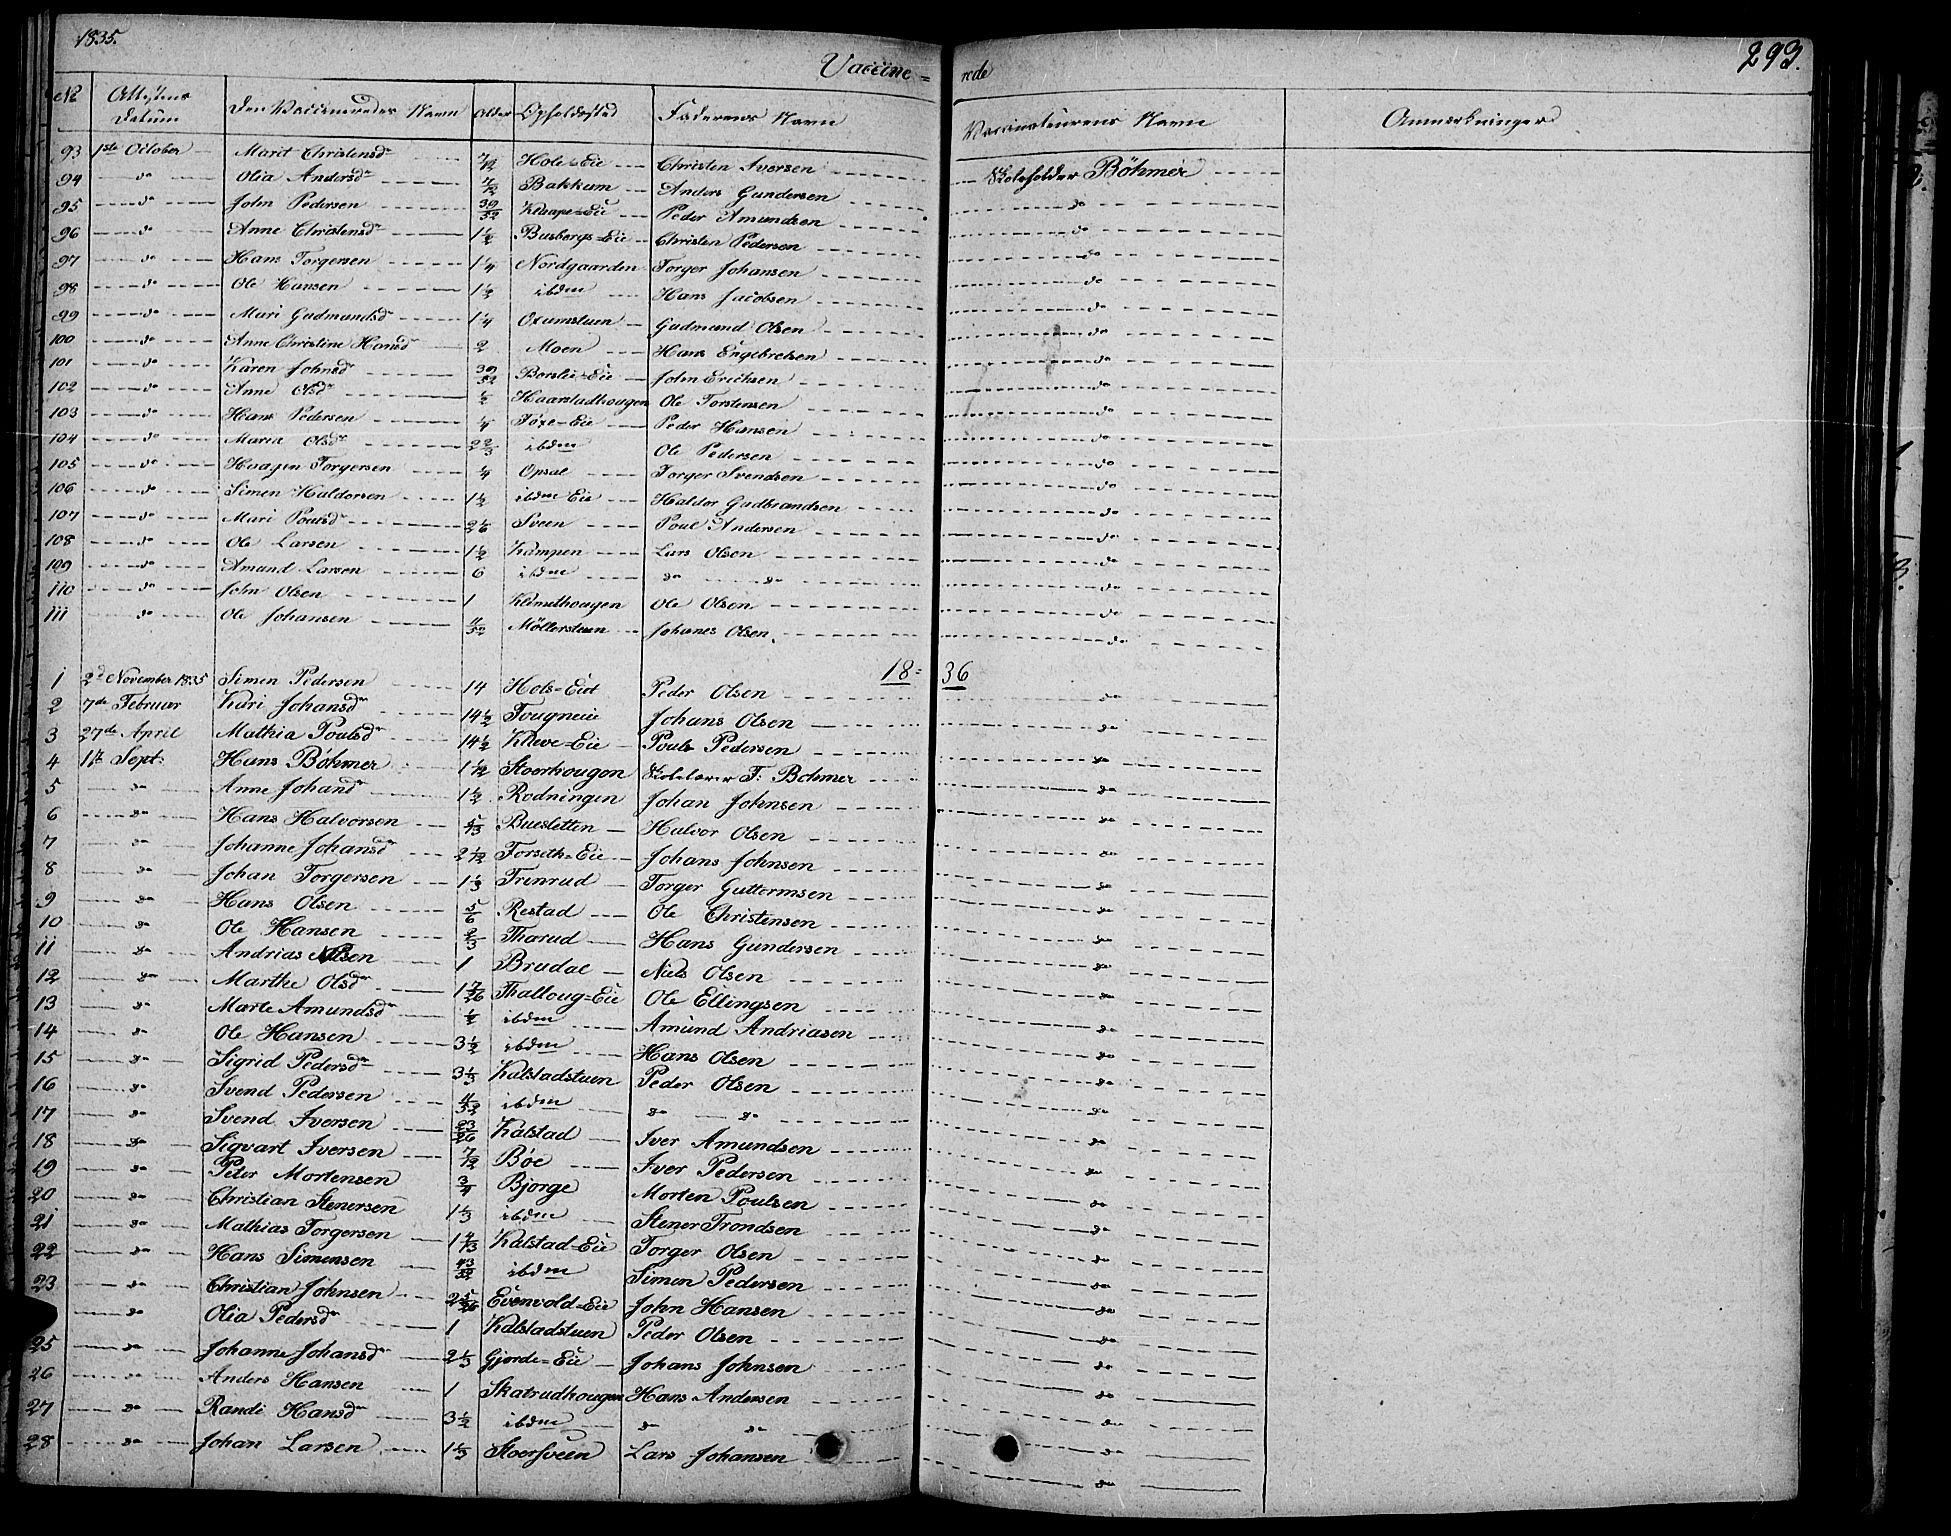 SAH, Gausdal prestekontor, Ministerialbok nr. 6, 1830-1839, s. 293